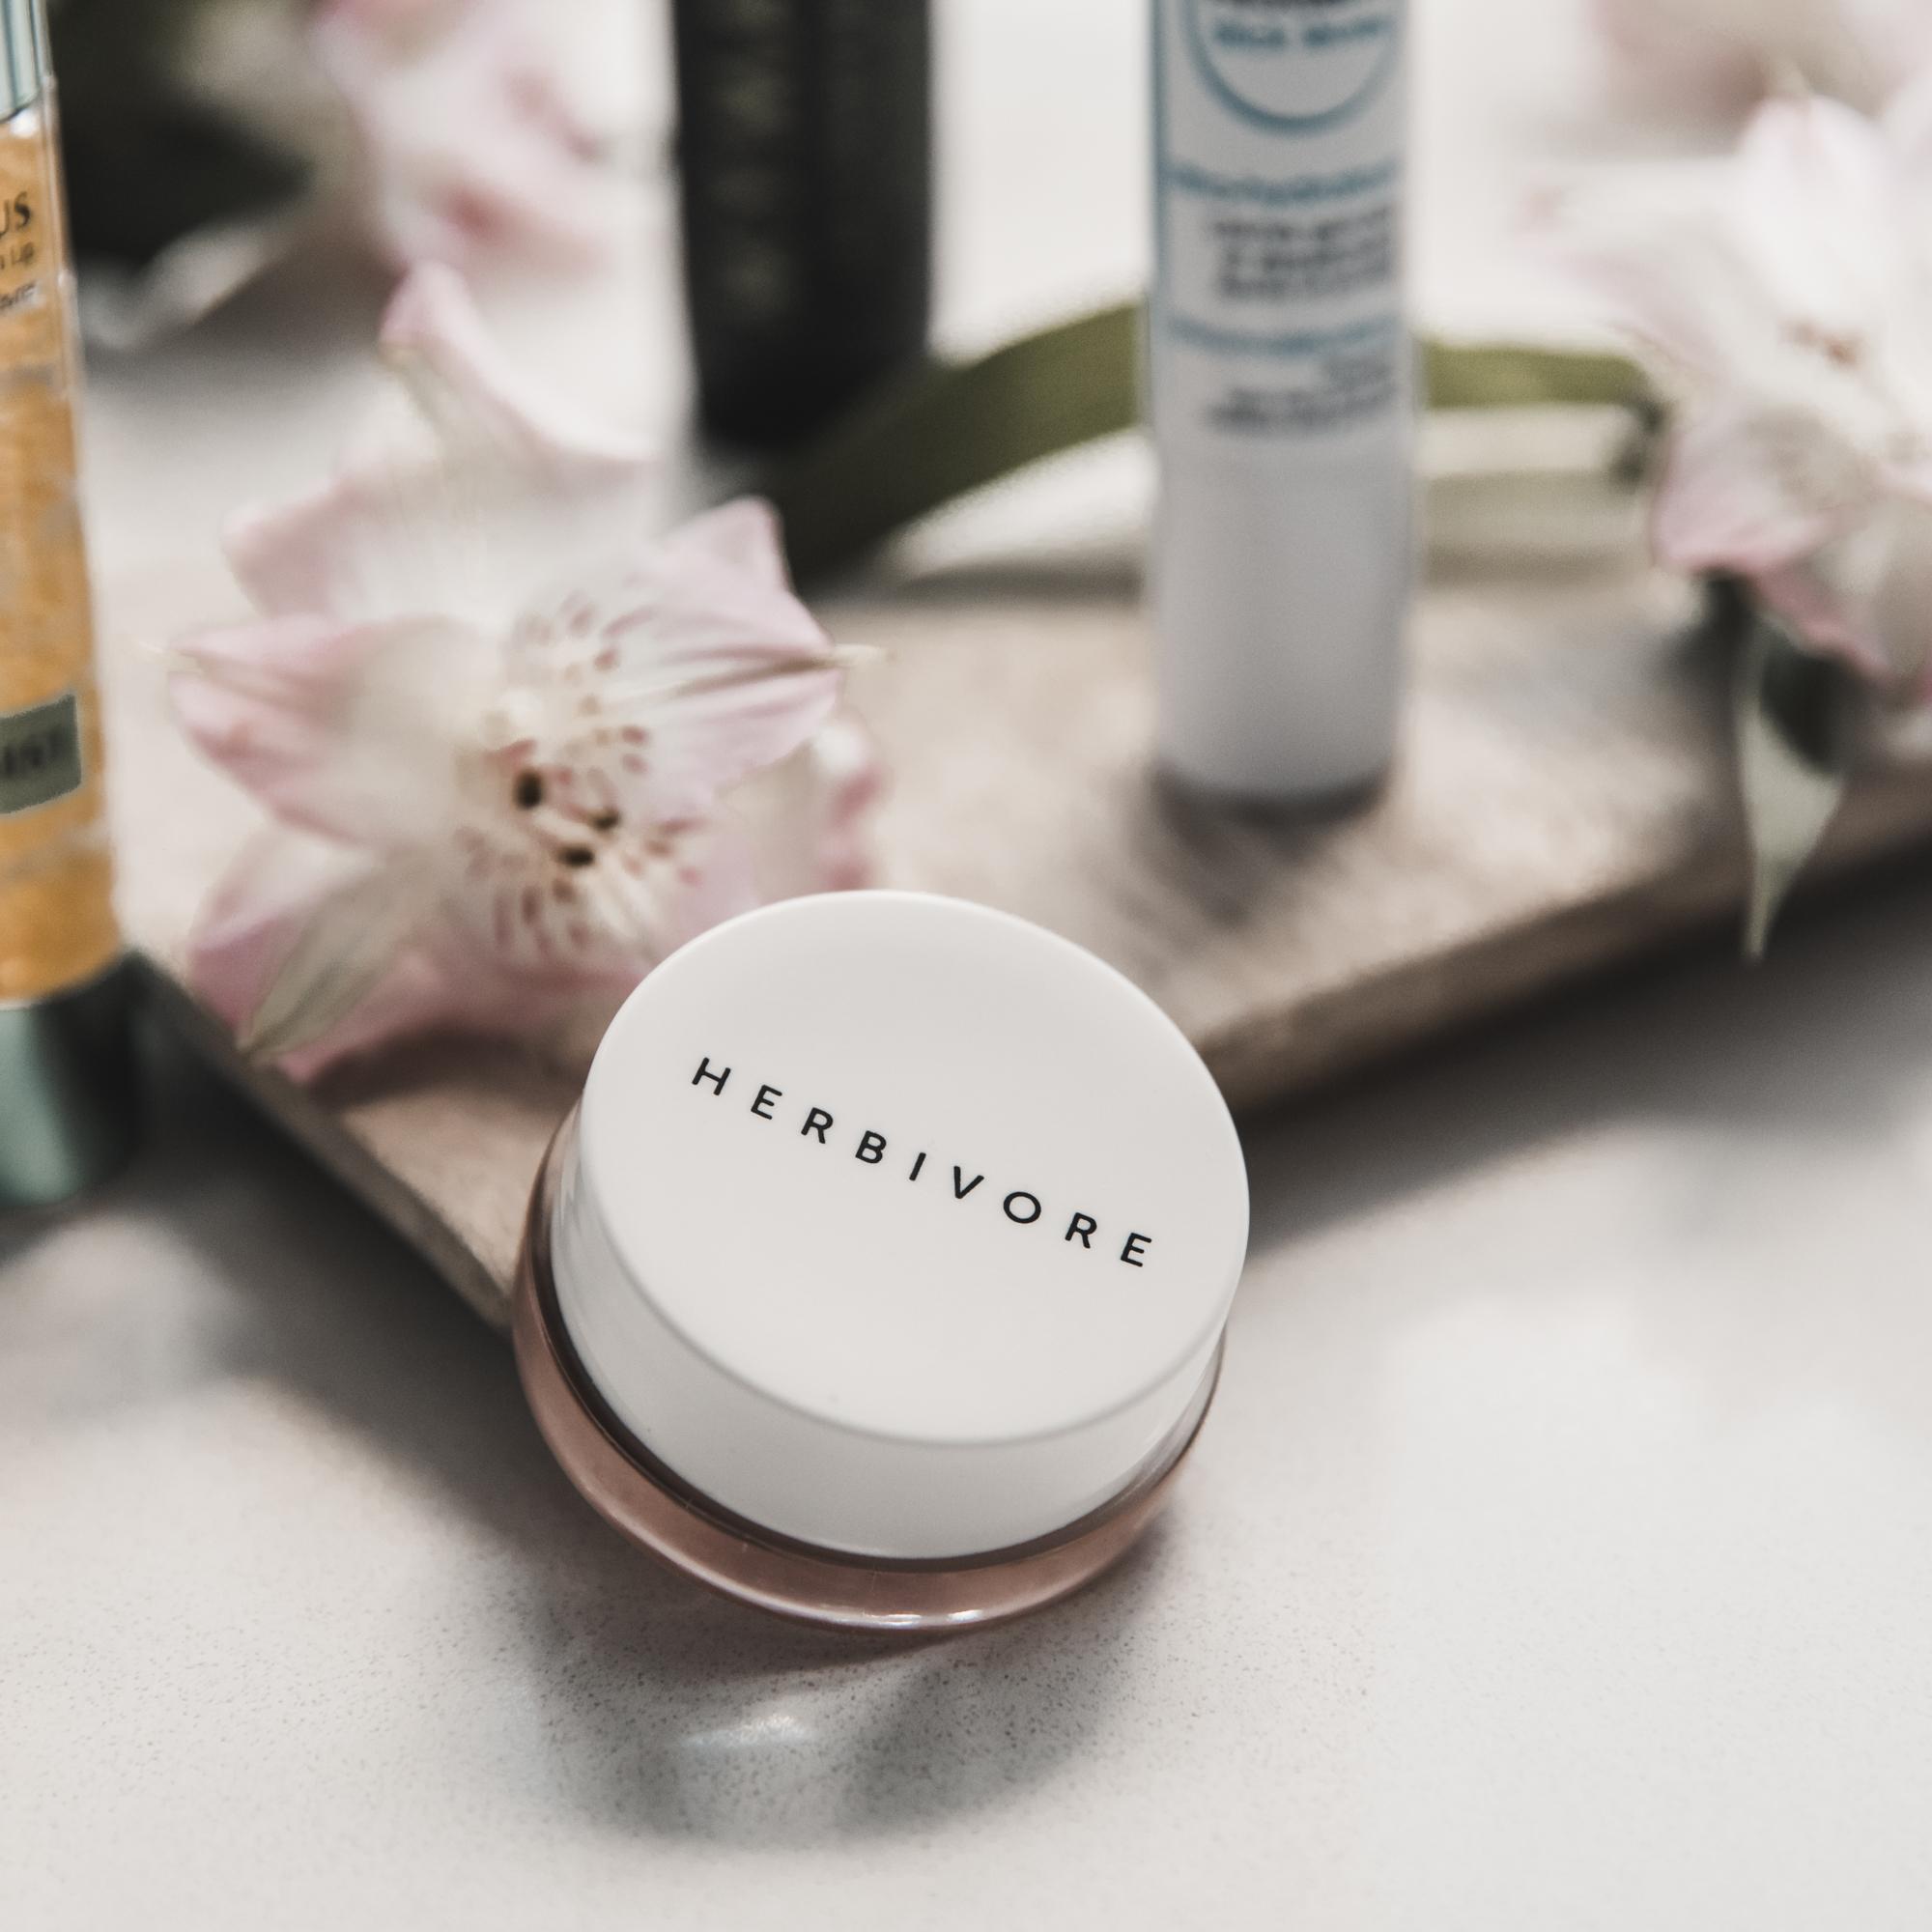 Herbivore - Coco Rose Coconut Oil Lip Conditioner